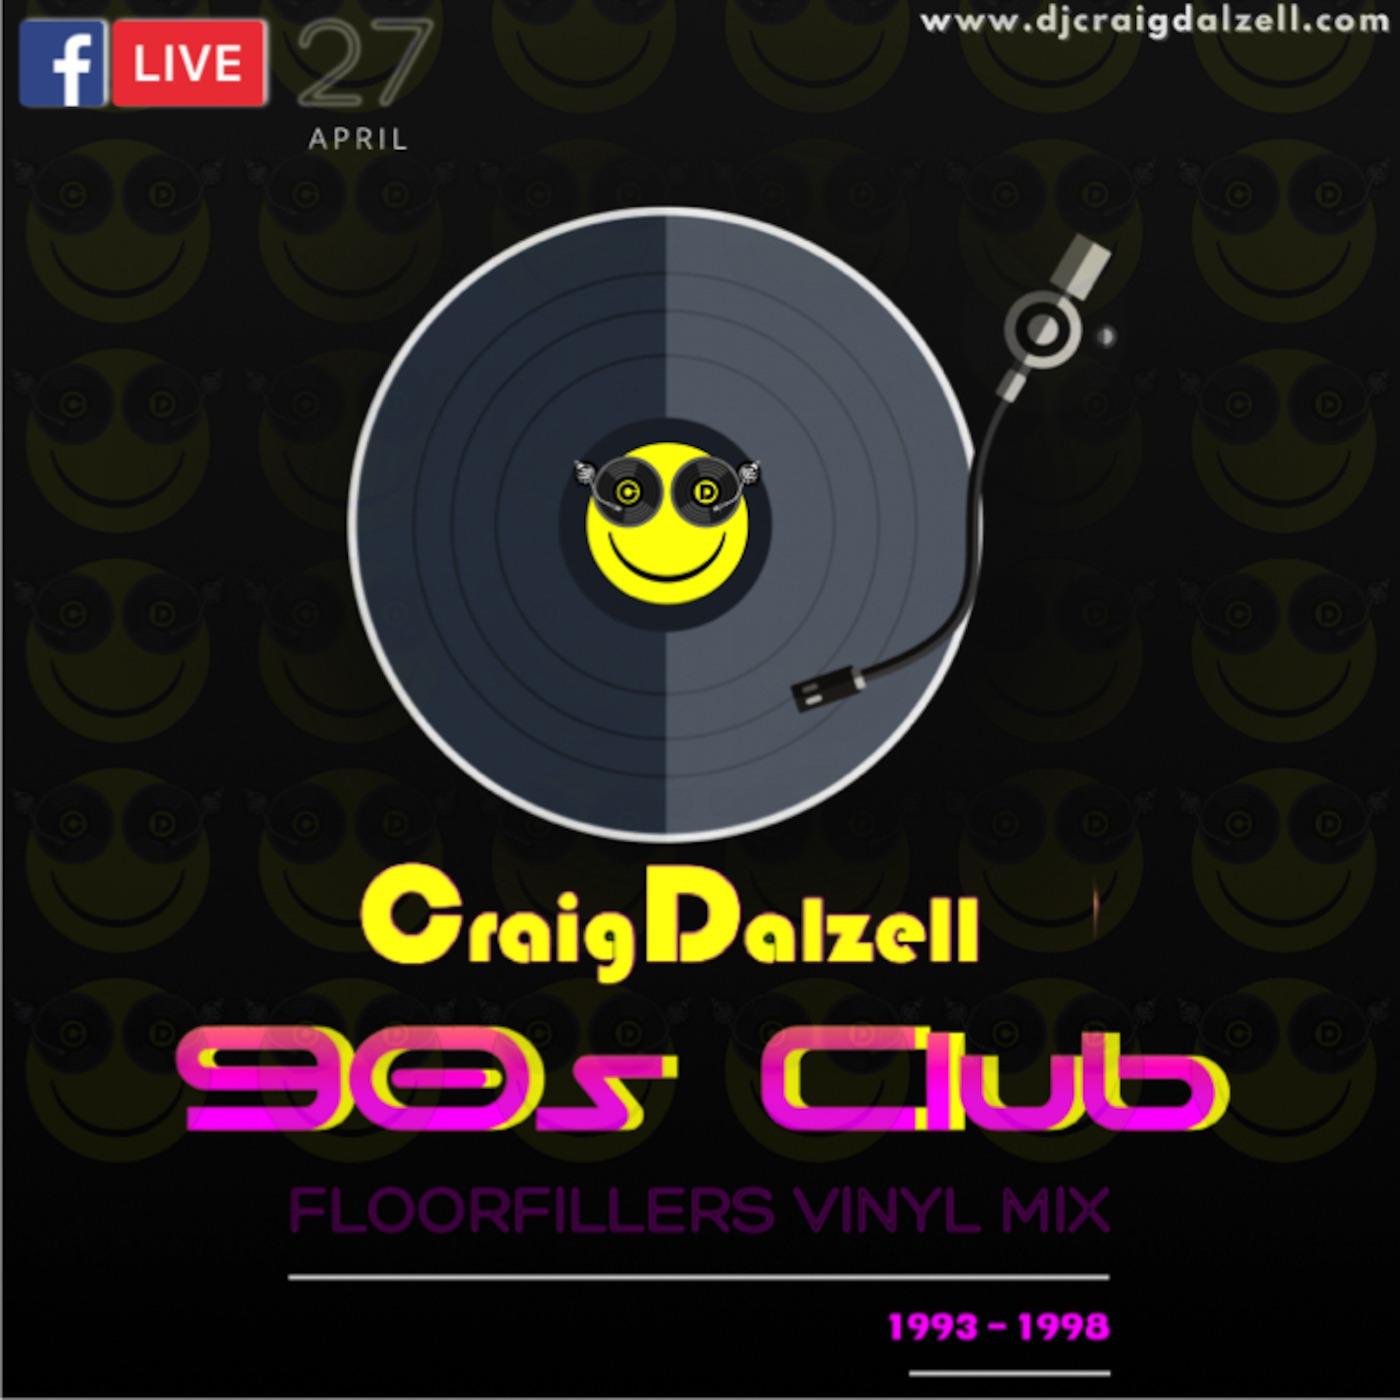 90s Club : Floorfillers Vinyl Mix ('93 - '98)    Craig